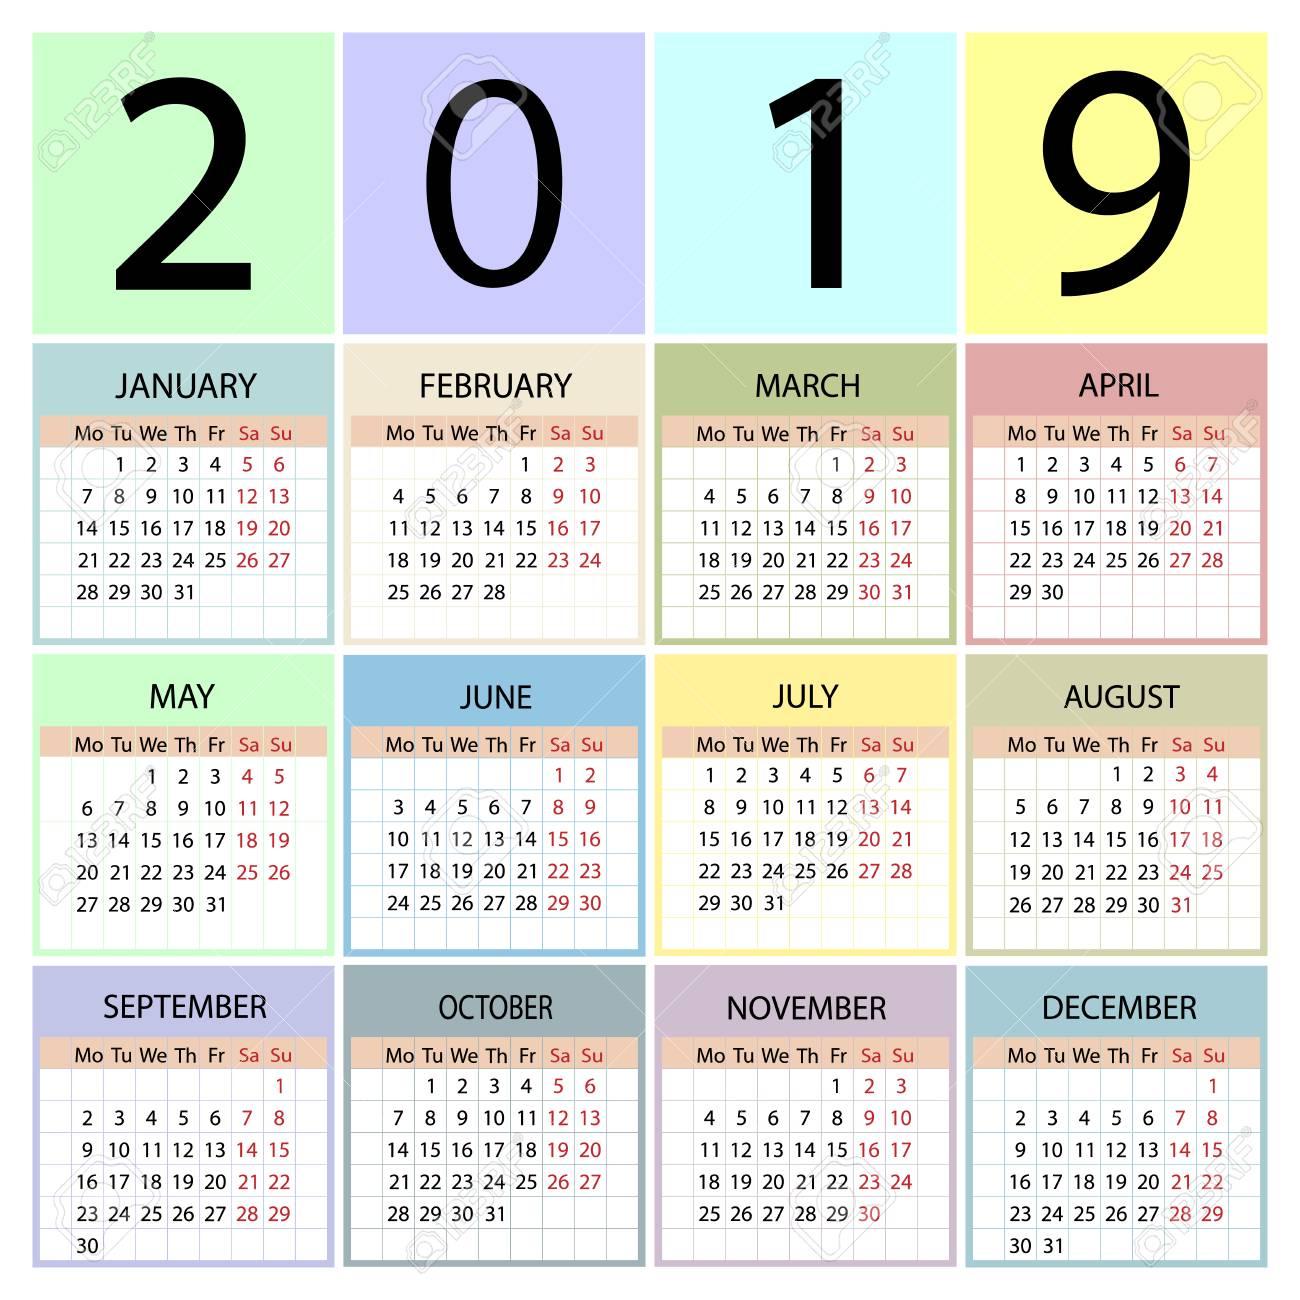 Calendario 2019 Con Numero Week.Calendar 2019 Year Week Starts With Monday